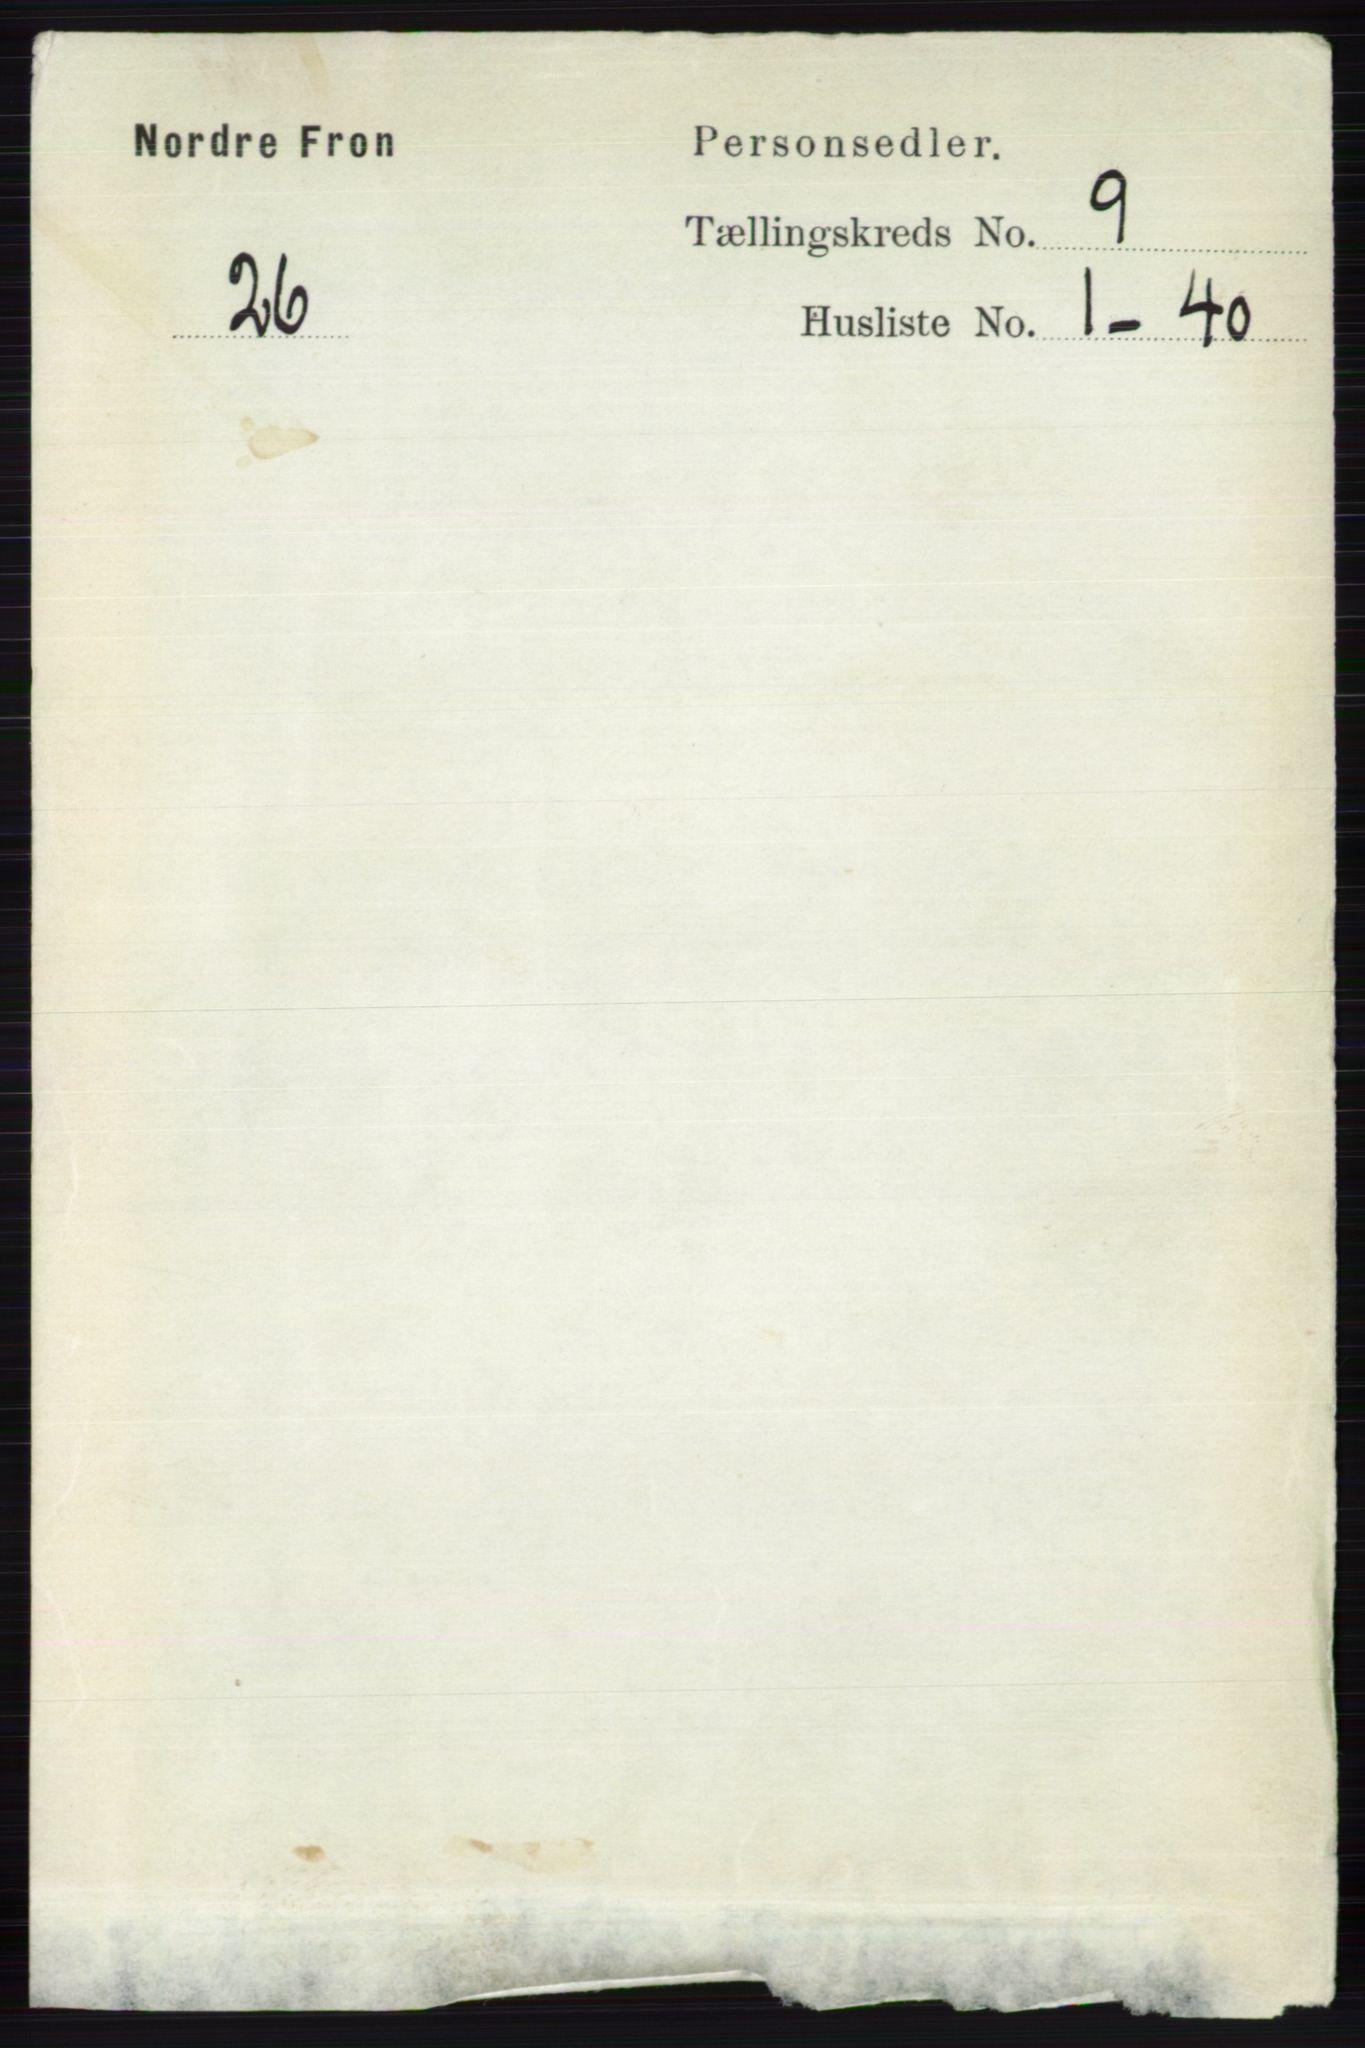 RA, Folketelling 1891 for 0518 Nord-Fron herred, 1891, s. 3713